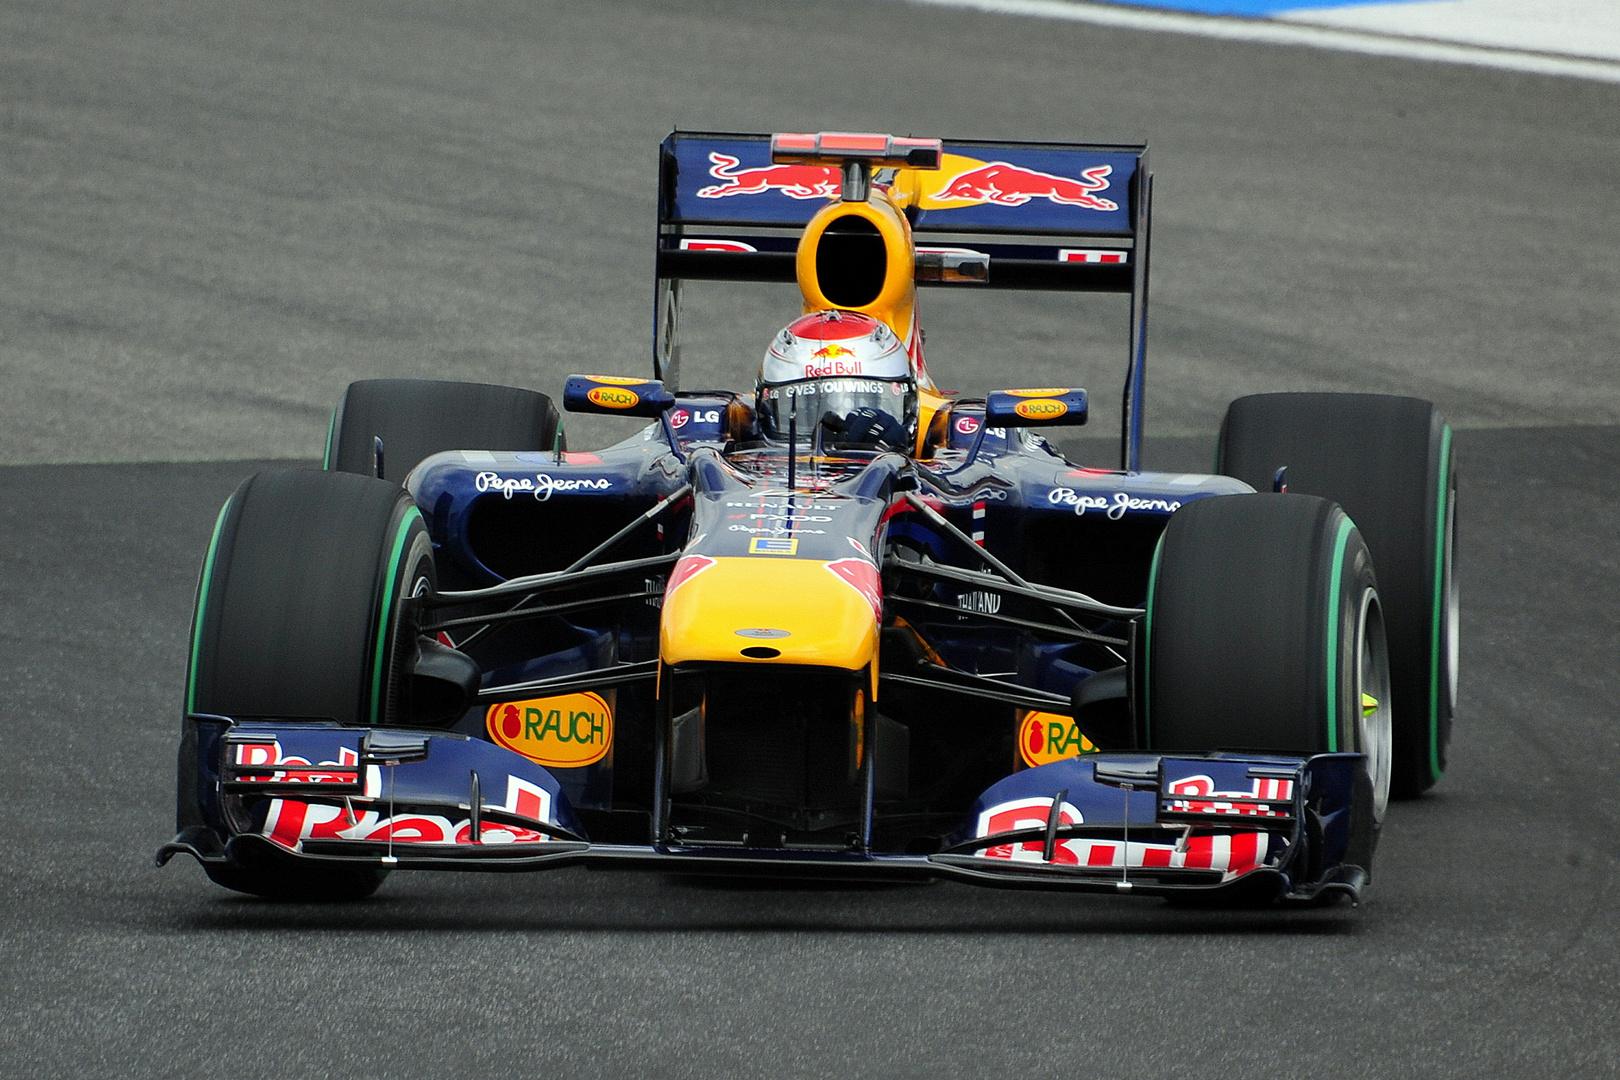 Vettel Hockenheimring 2010